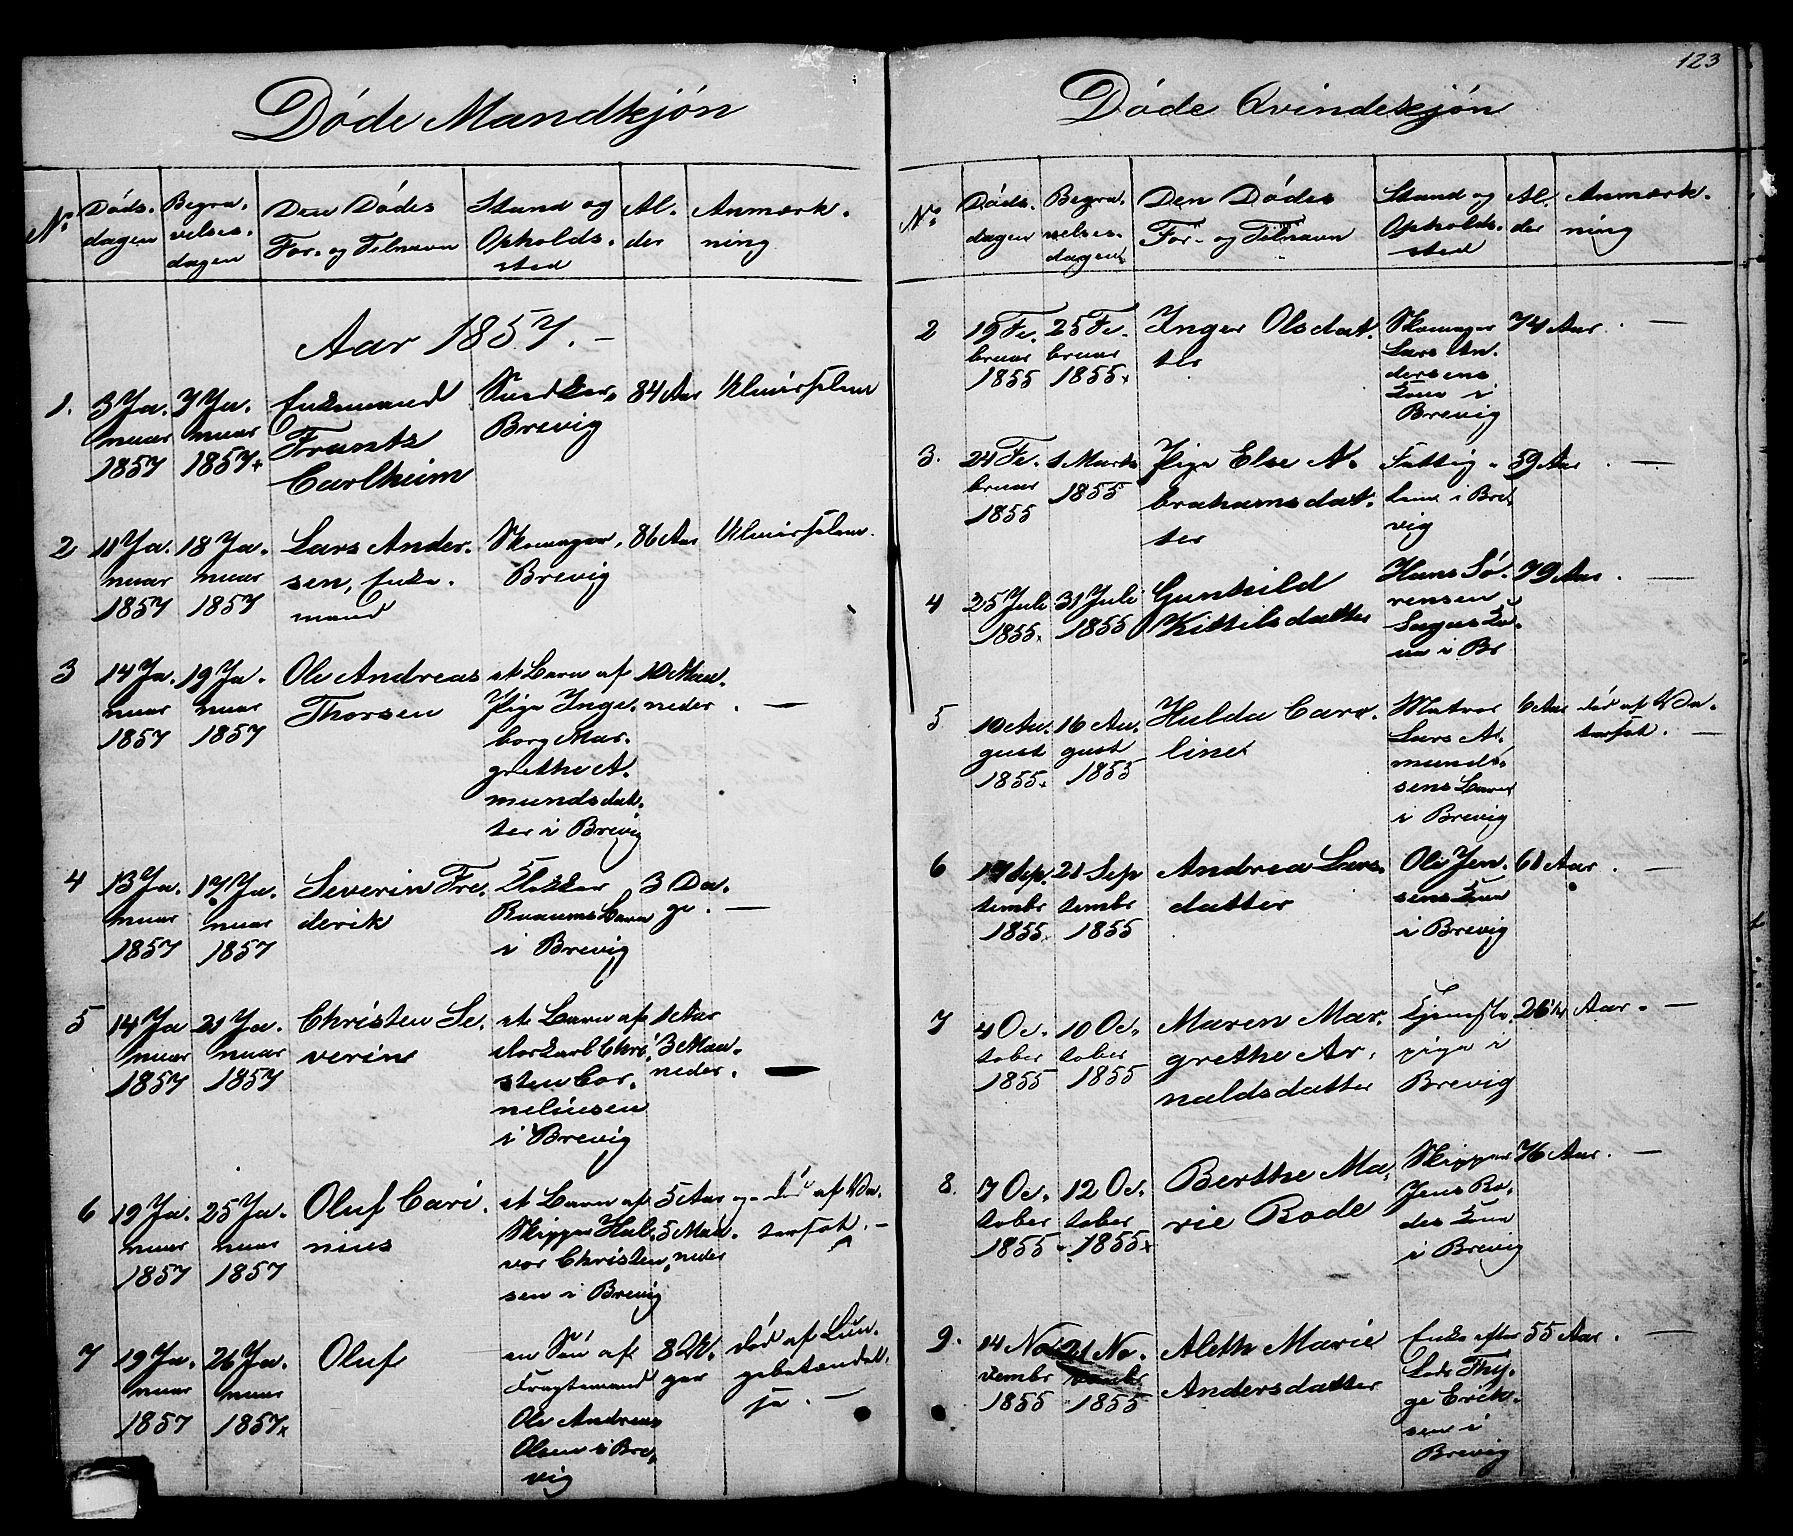 SAKO, Brevik kirkebøker, G/Ga/L0002: Klokkerbok nr. 2, 1846-1865, s. 123